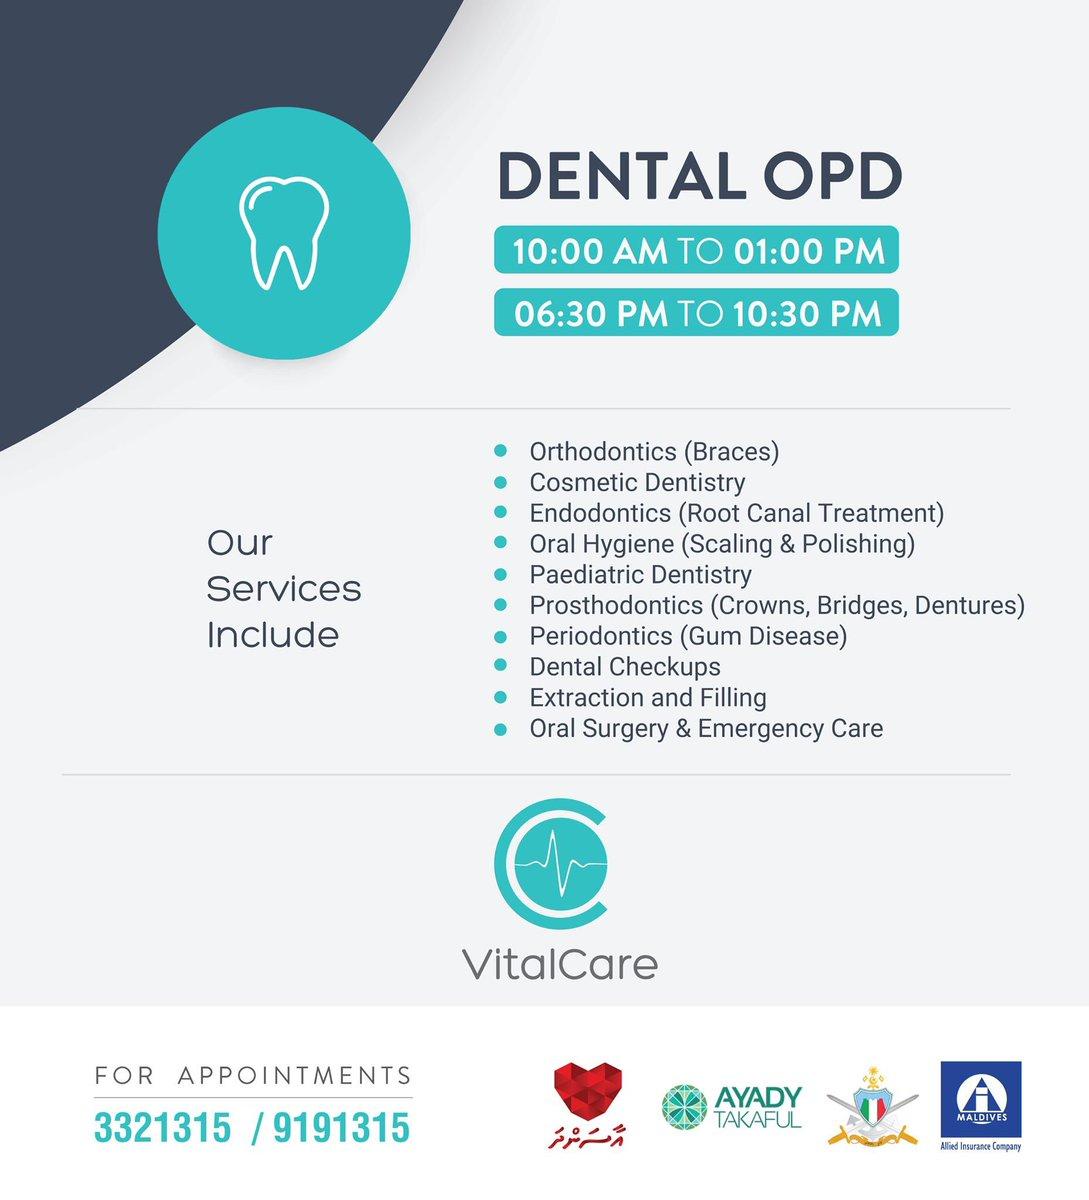 Dentistry In Maldives